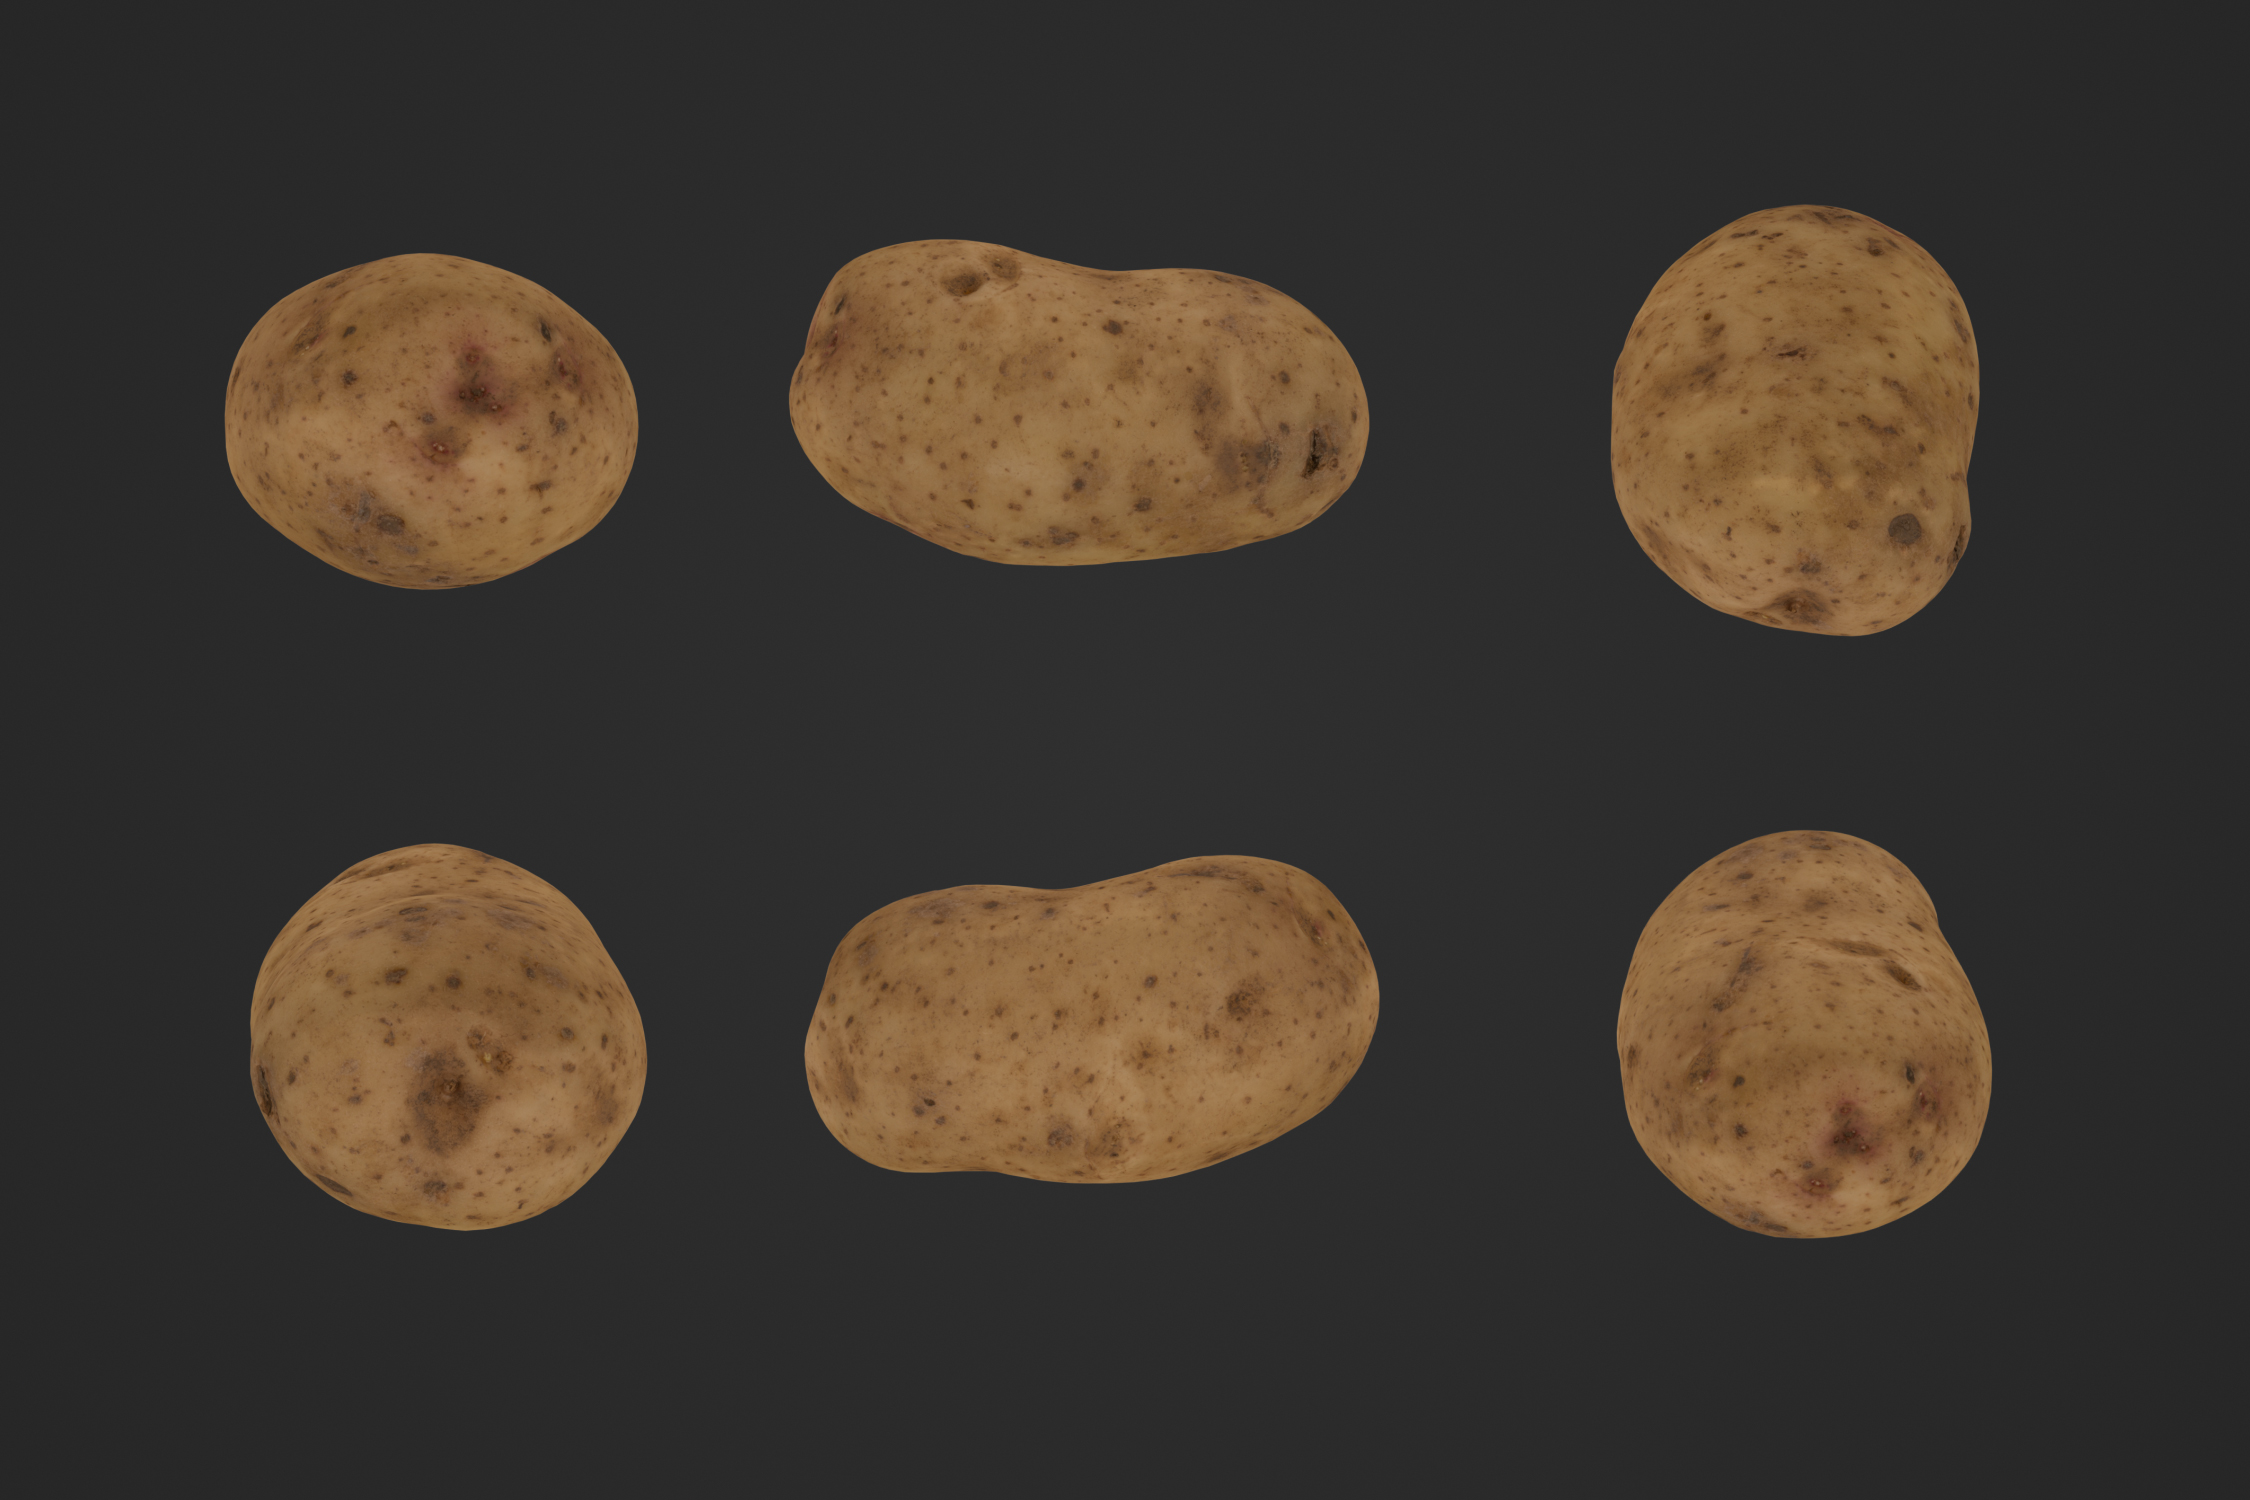 Potato_1_1.jpg